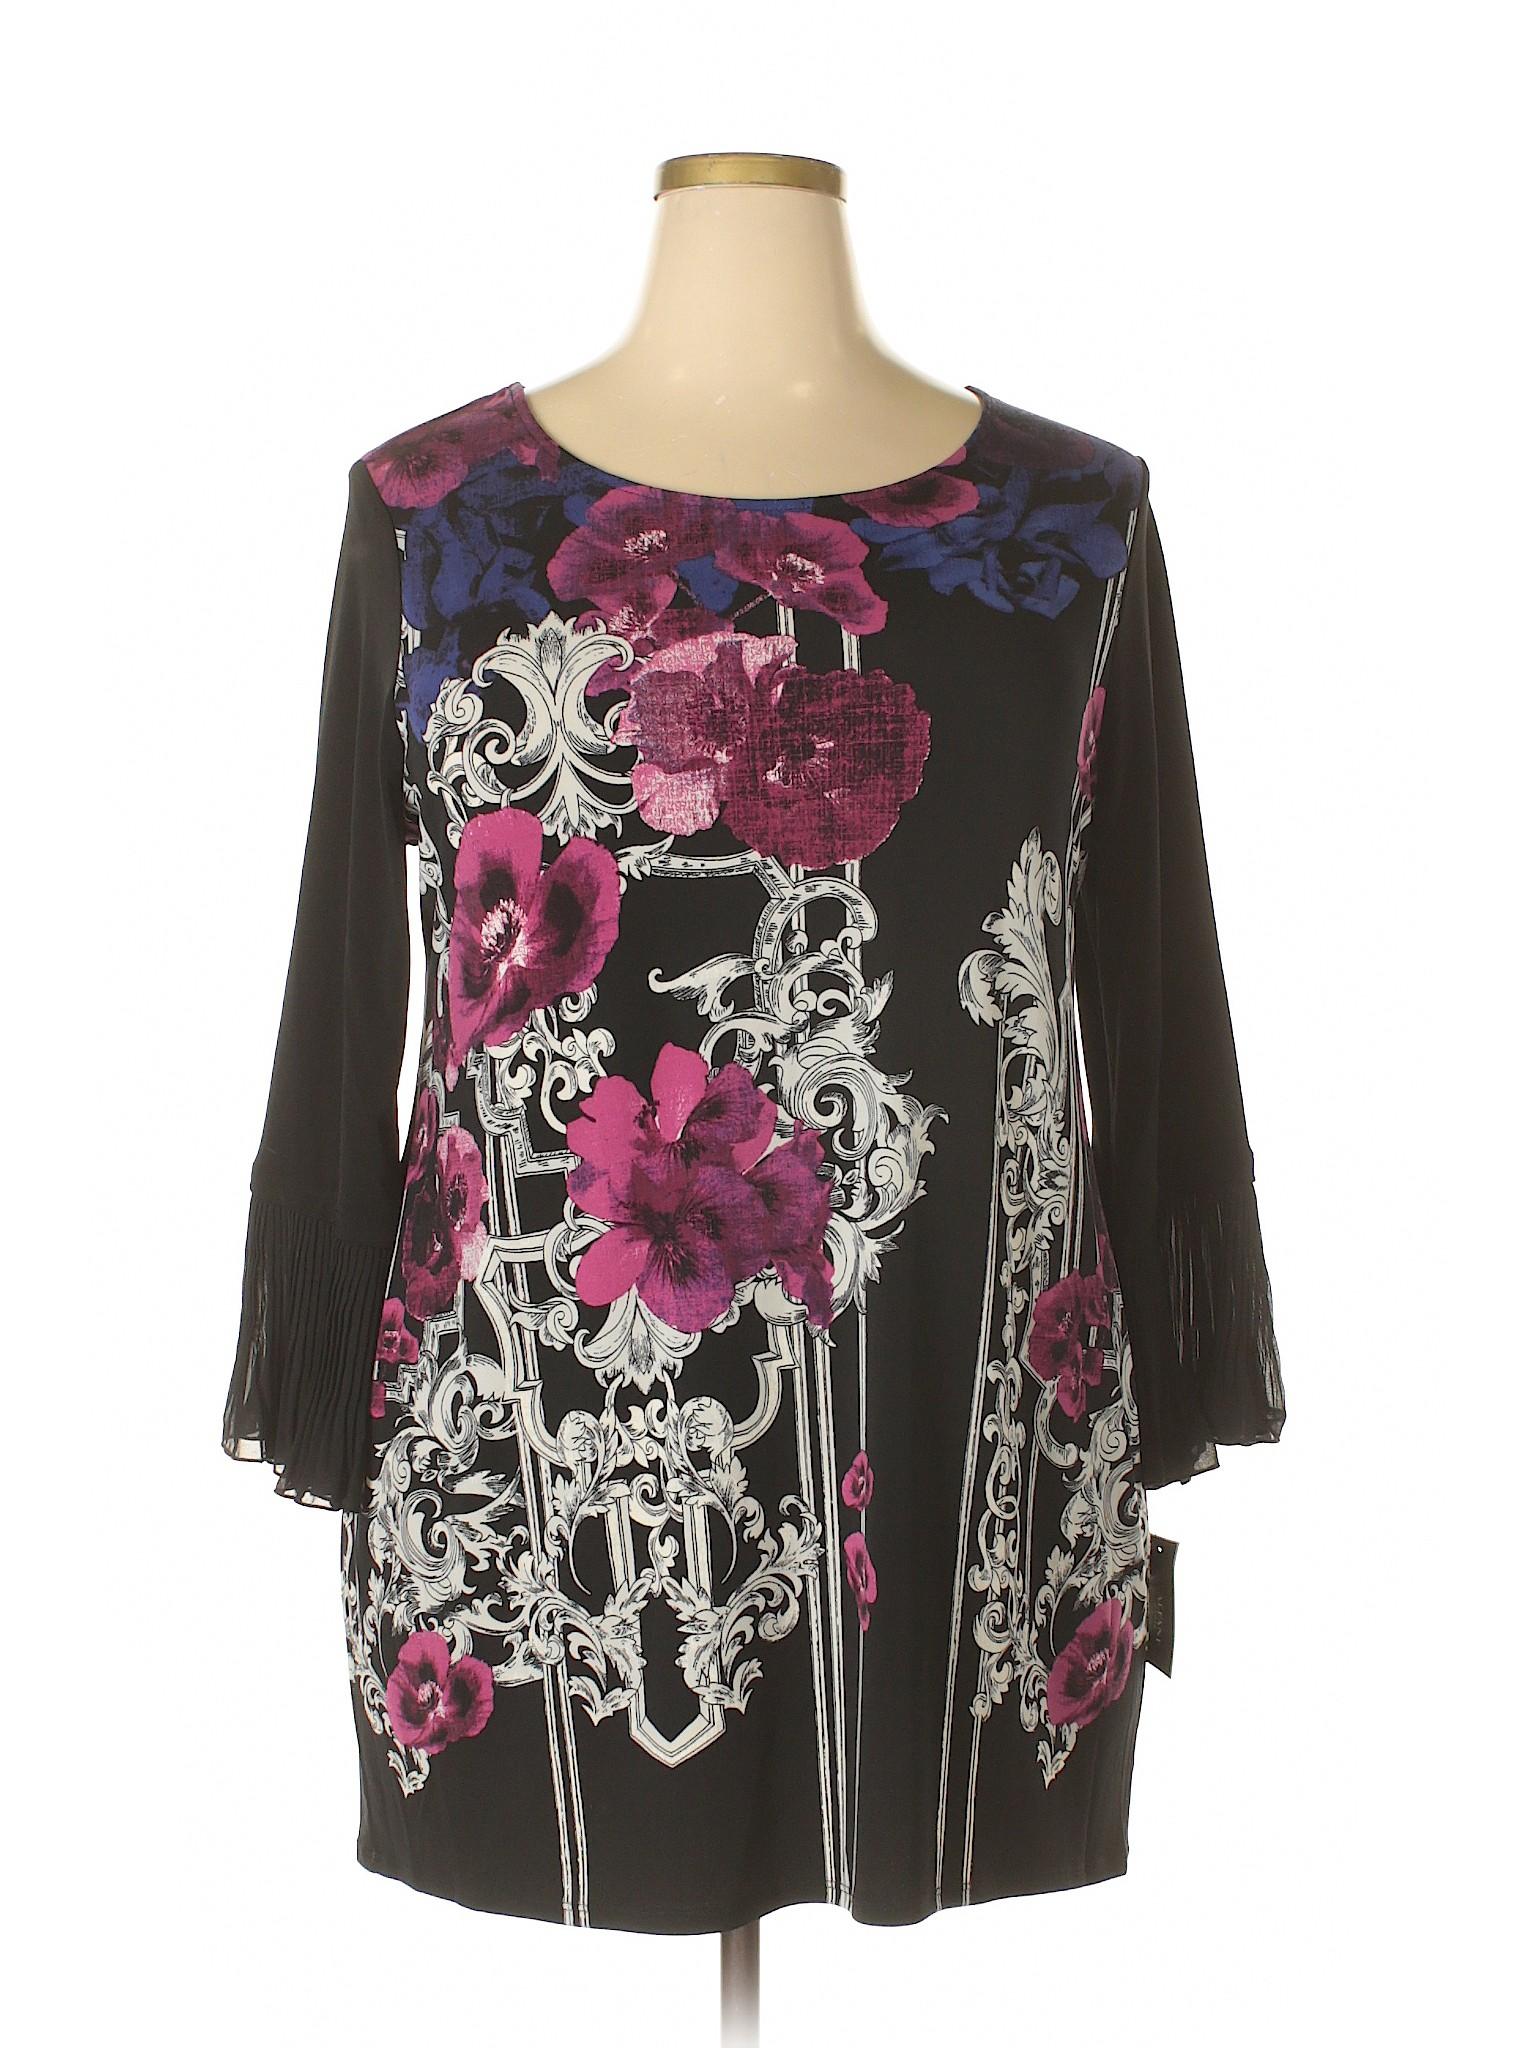 Alfani Selling Alfani Selling Casual Alfani Casual Dress Casual Selling Dress qZ1Z6